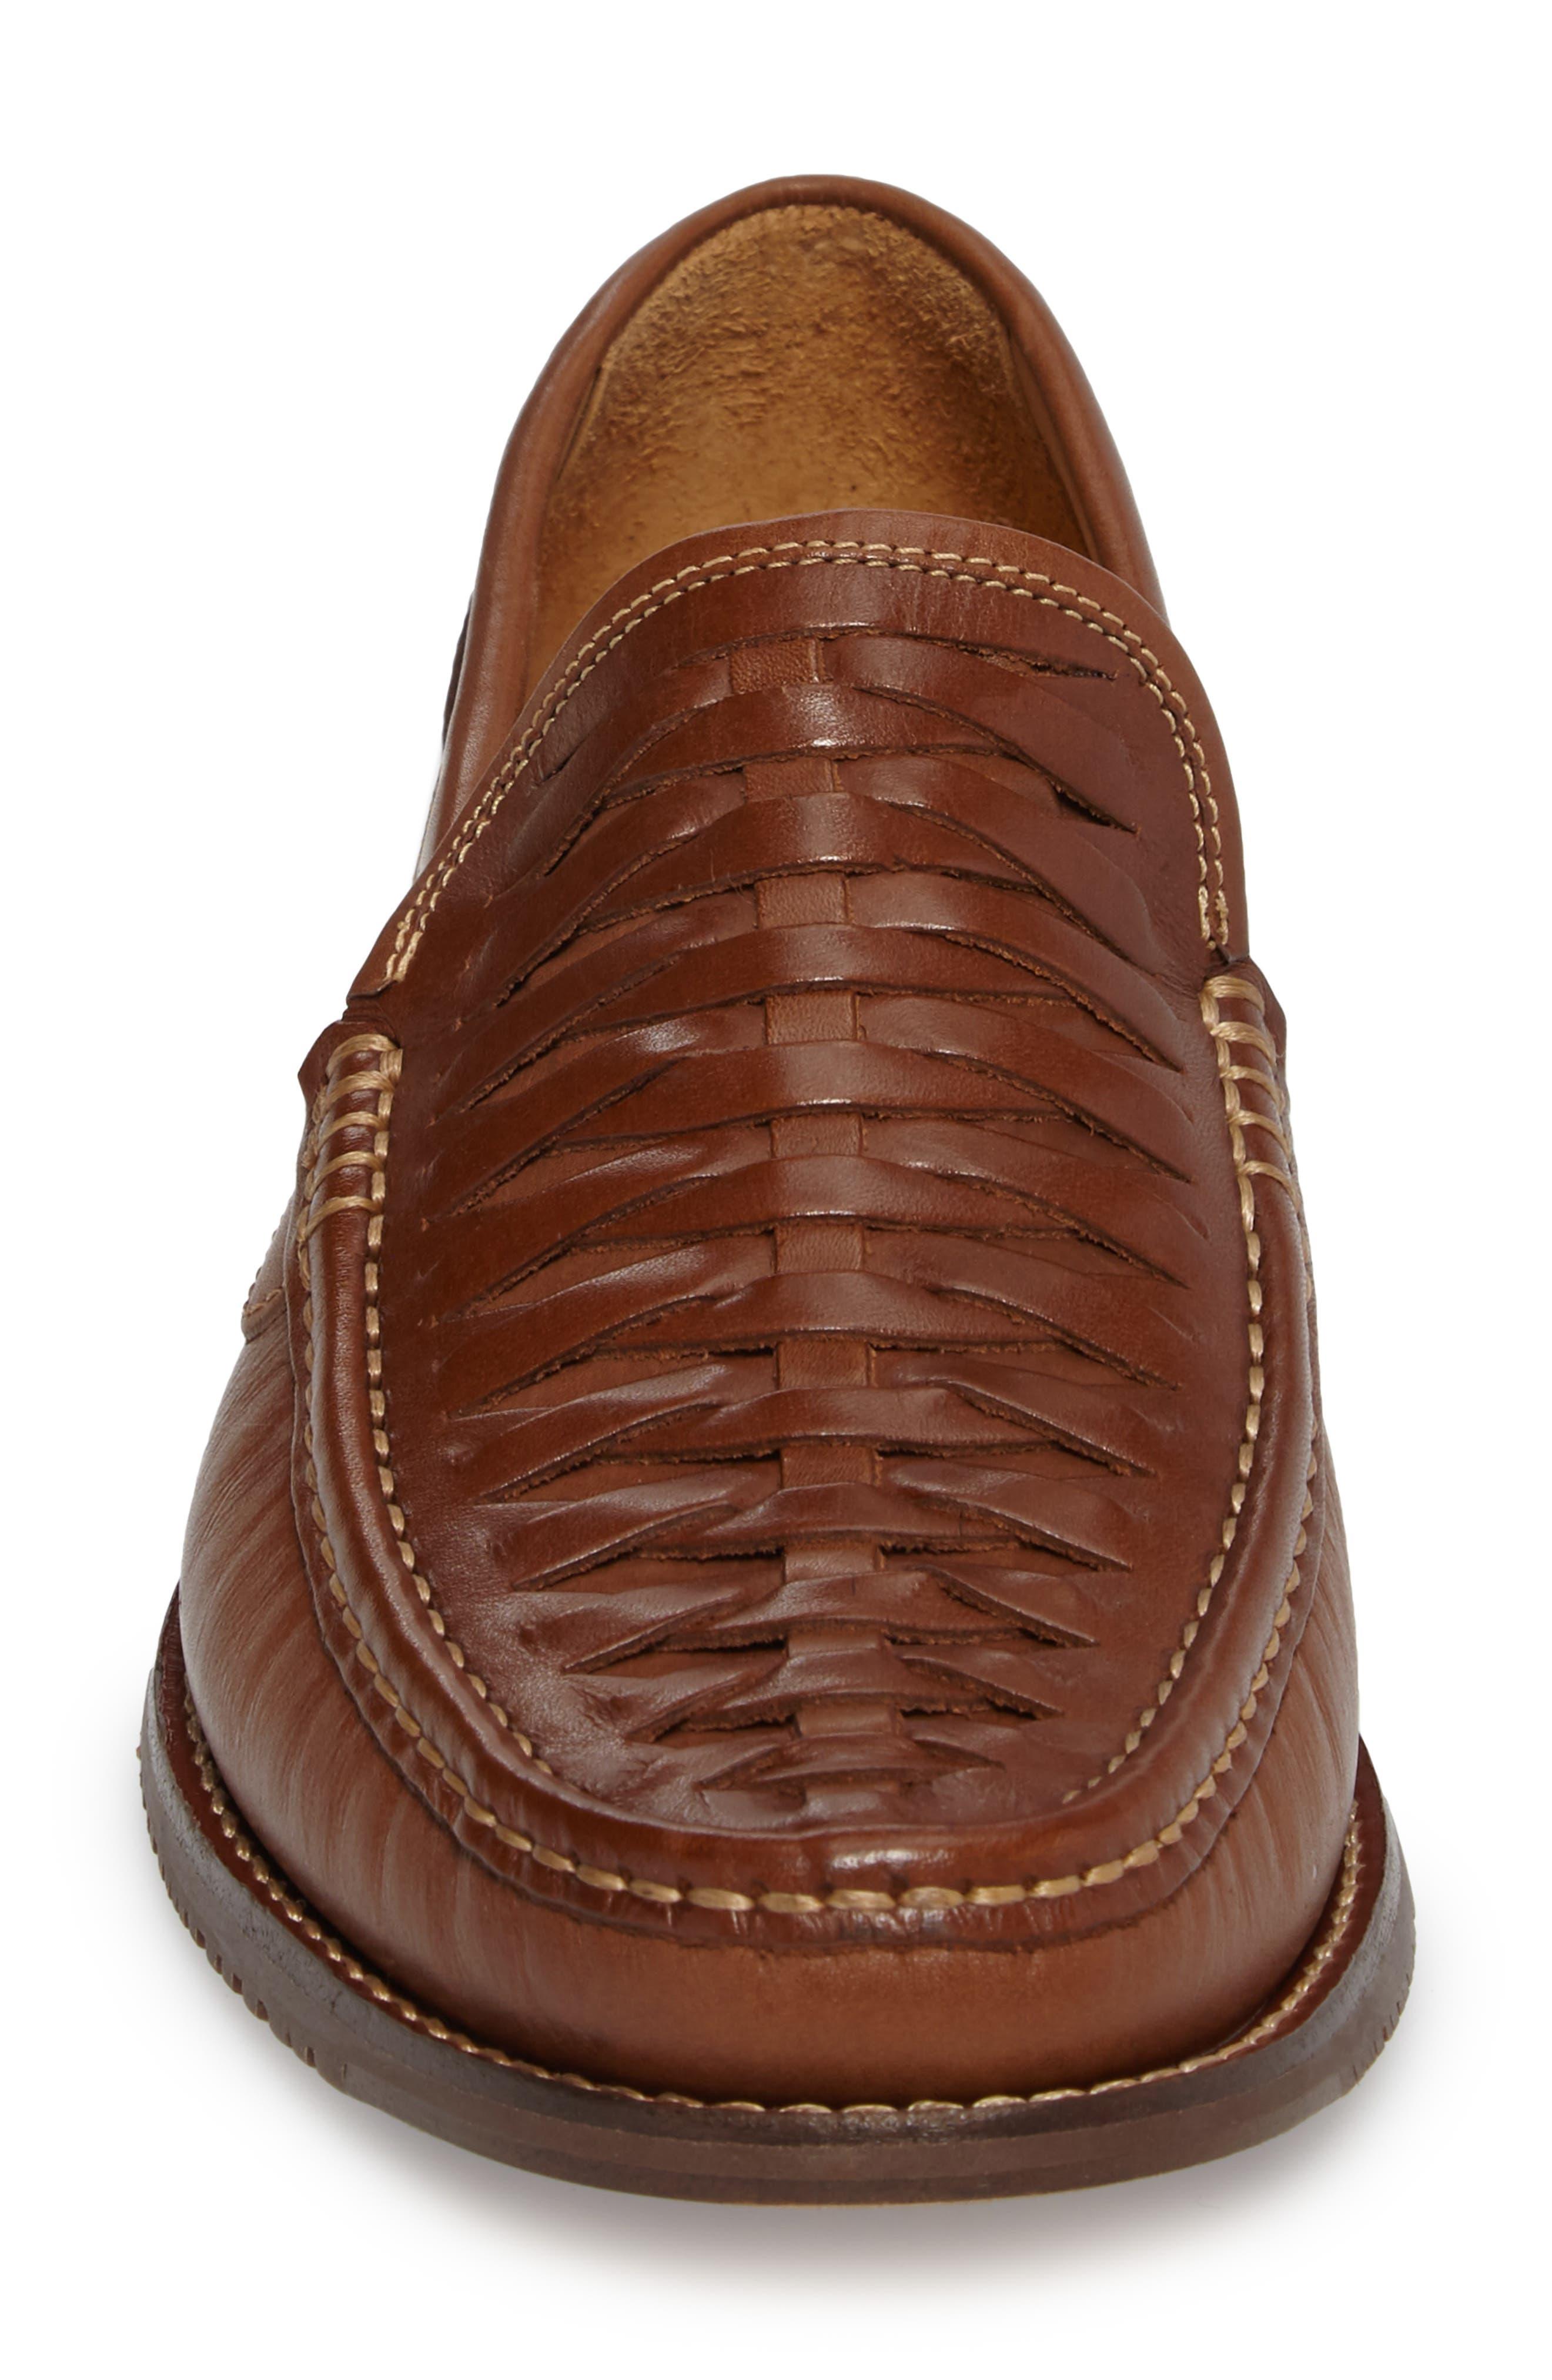 Fynn Loafer,                             Alternate thumbnail 4, color,                             Saddle Brown Leather